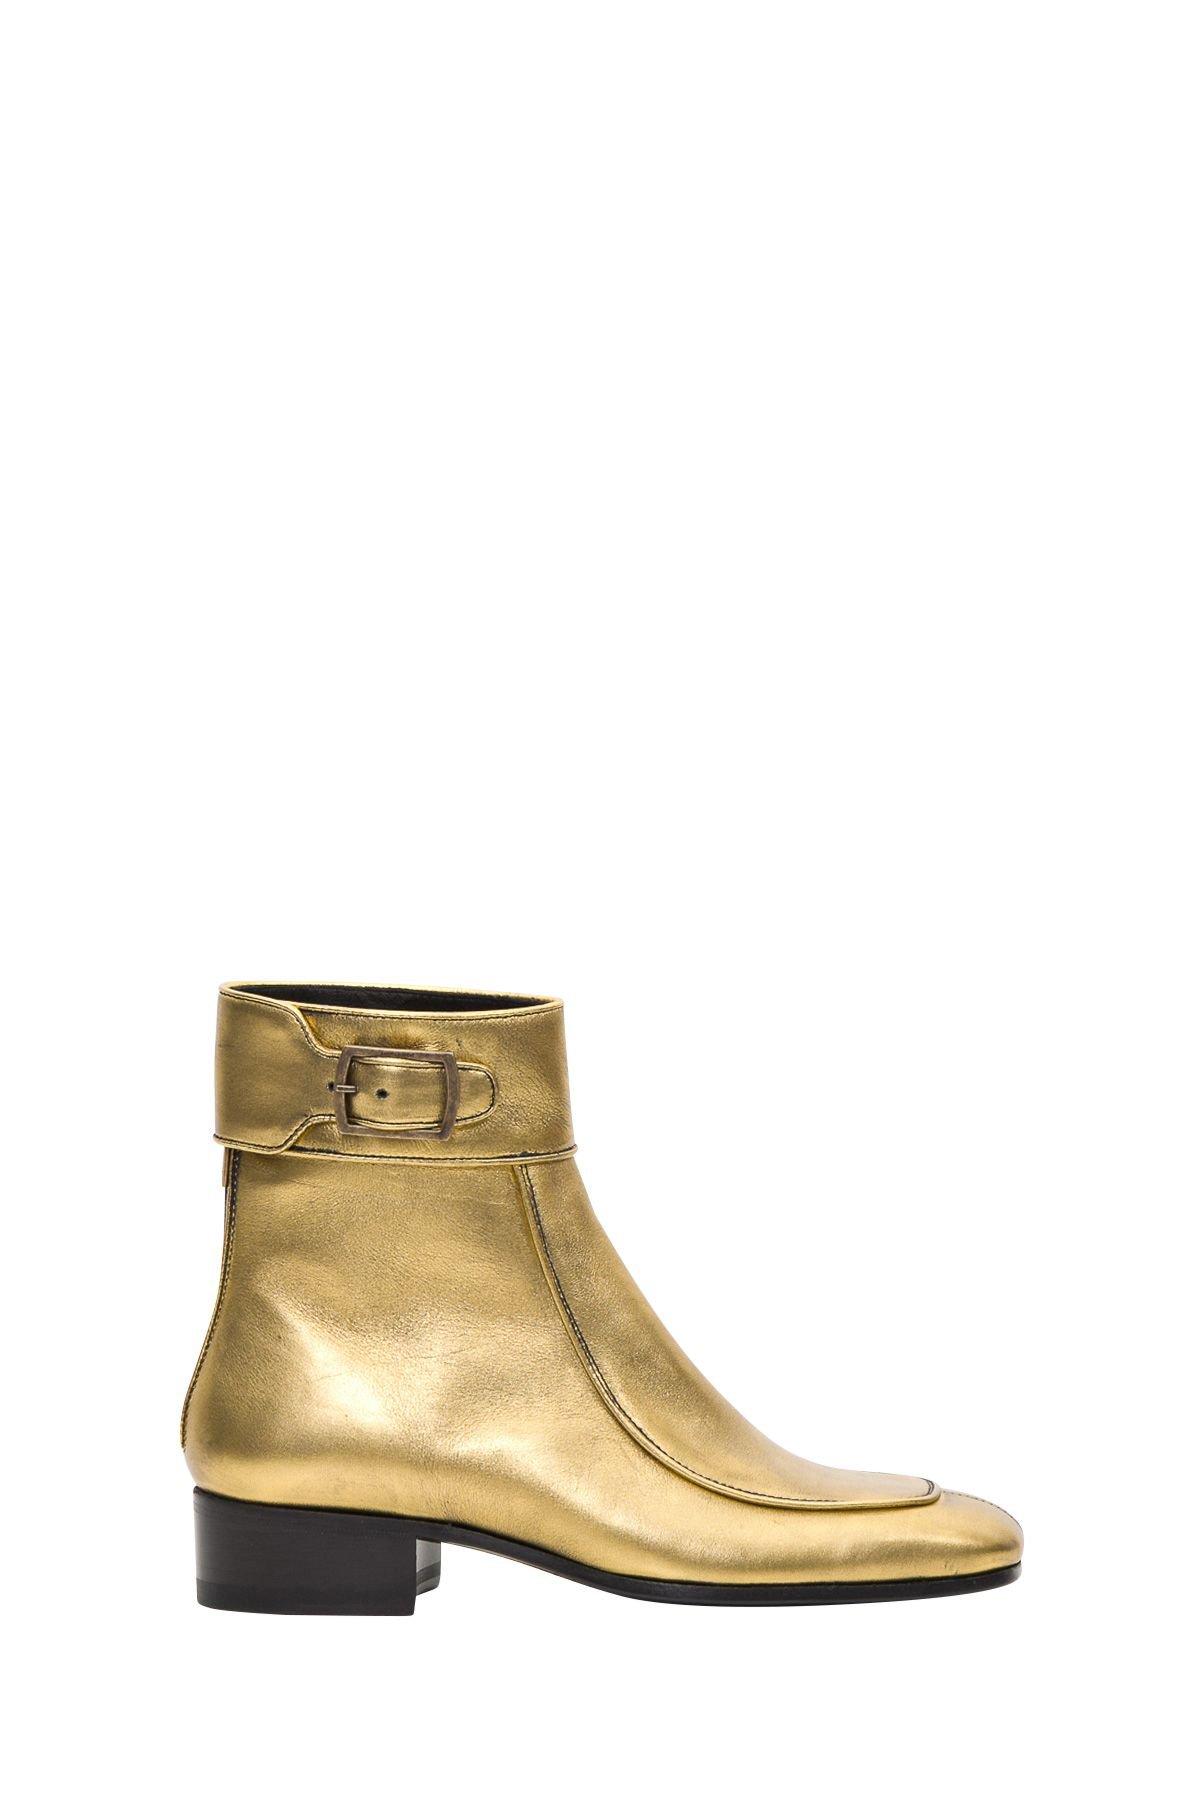 Saint Laurent Miles Boots In Metallic Leather